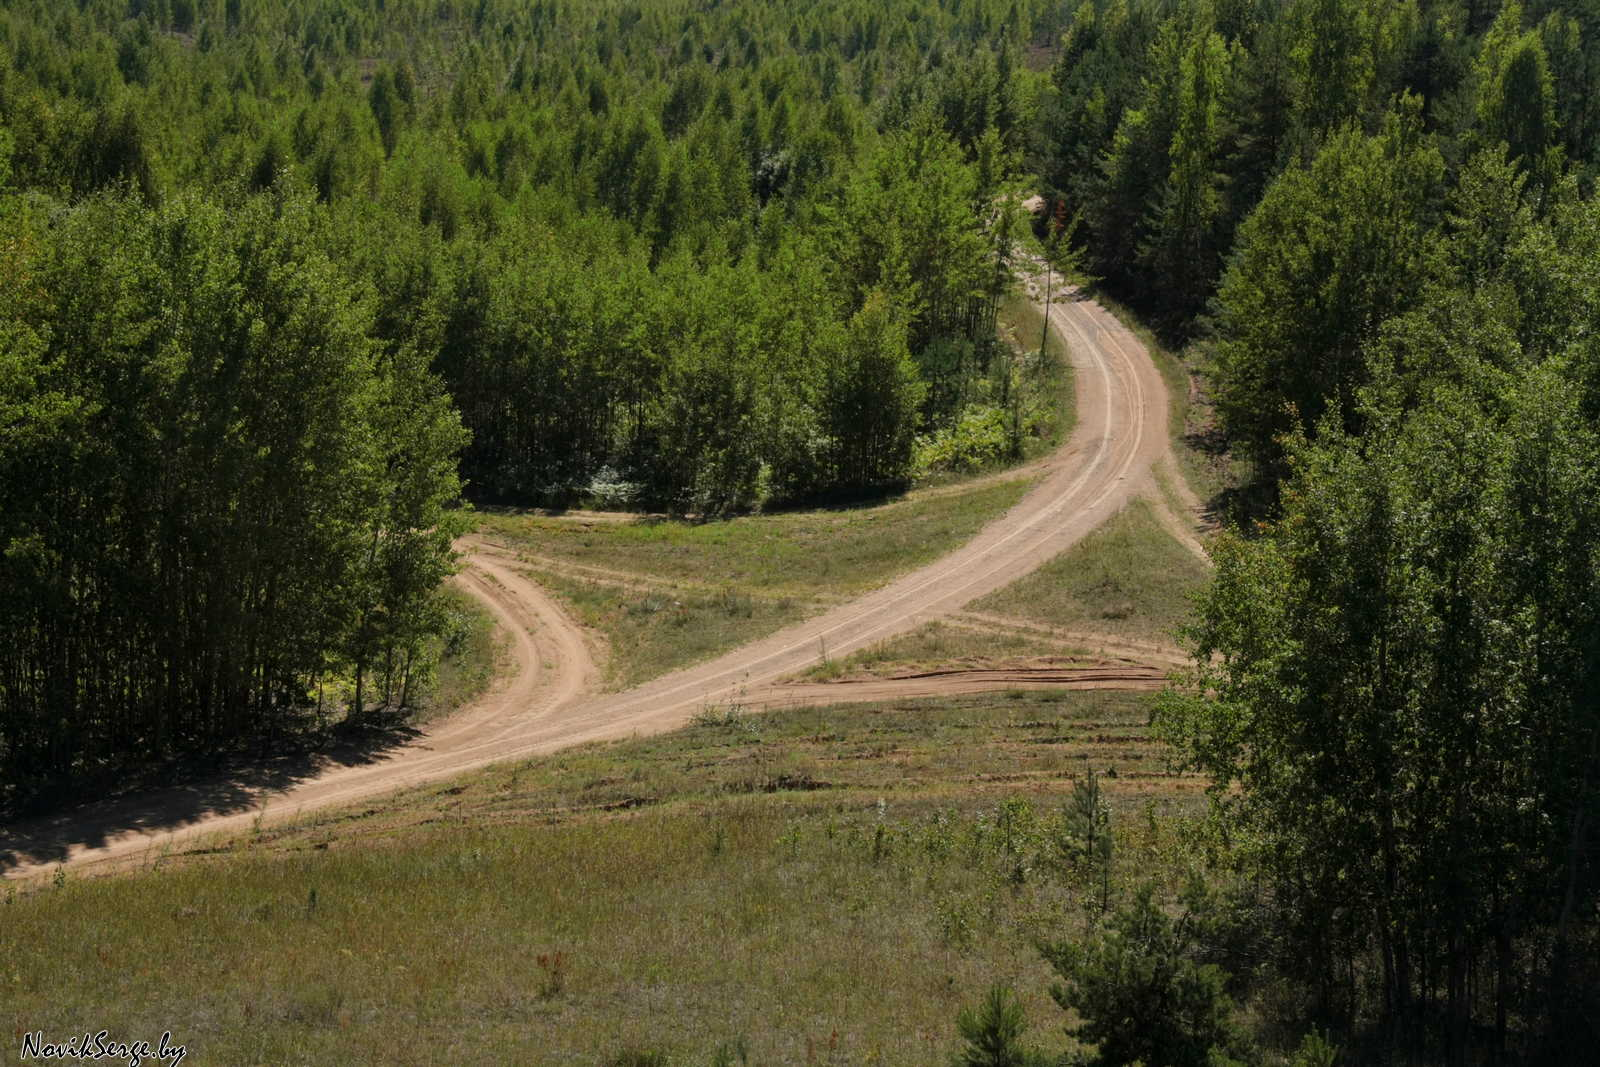 лесная дорога, перекрёсток